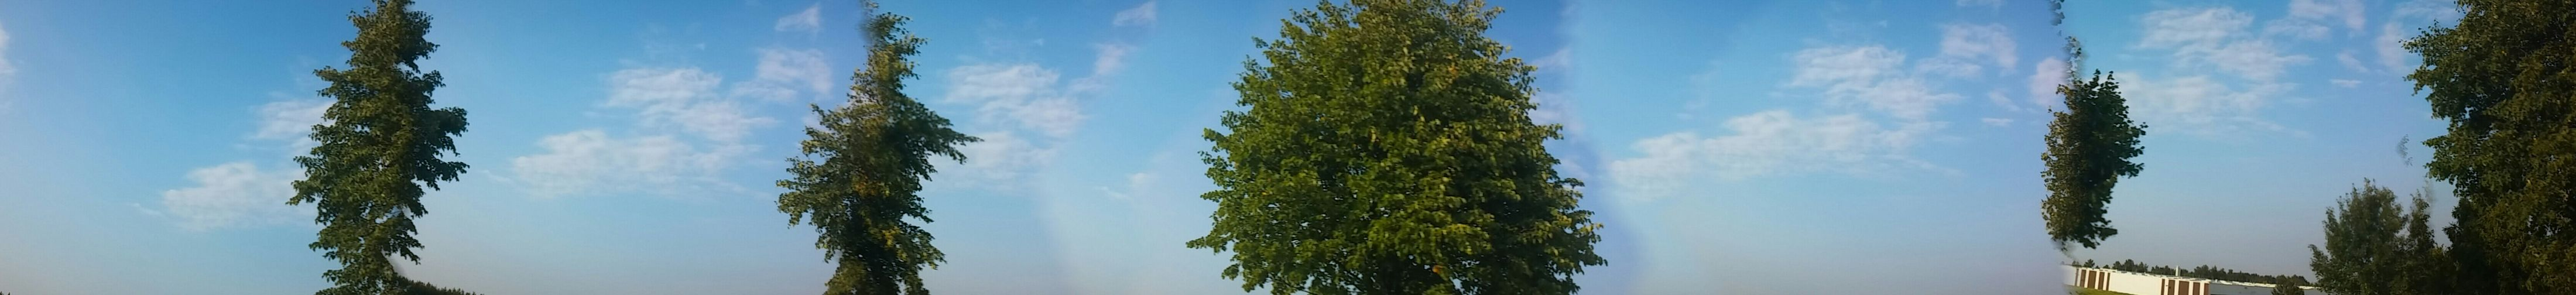 Panorama Trees